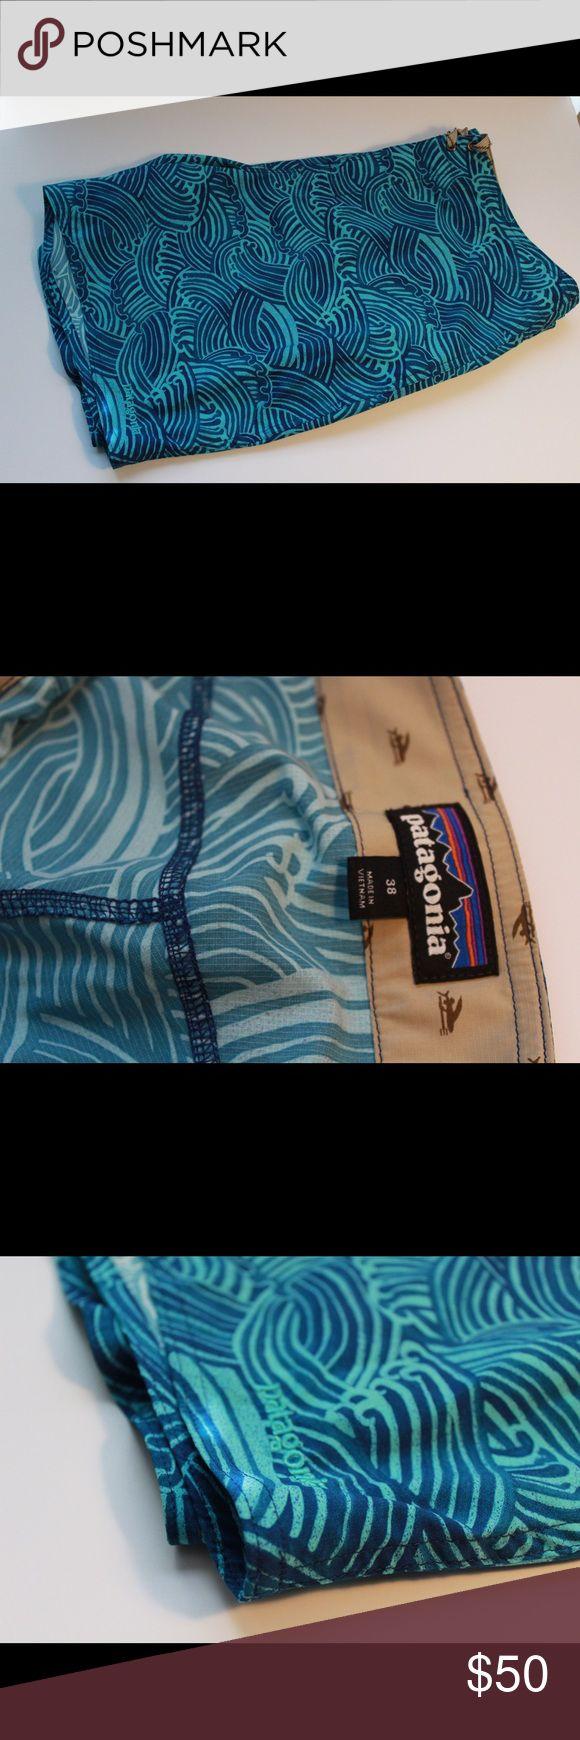 Patagonia board shorts sz 38 New Patagonia board shorts size 38 without tags. New board prints. Patagonia Swim Board Shorts